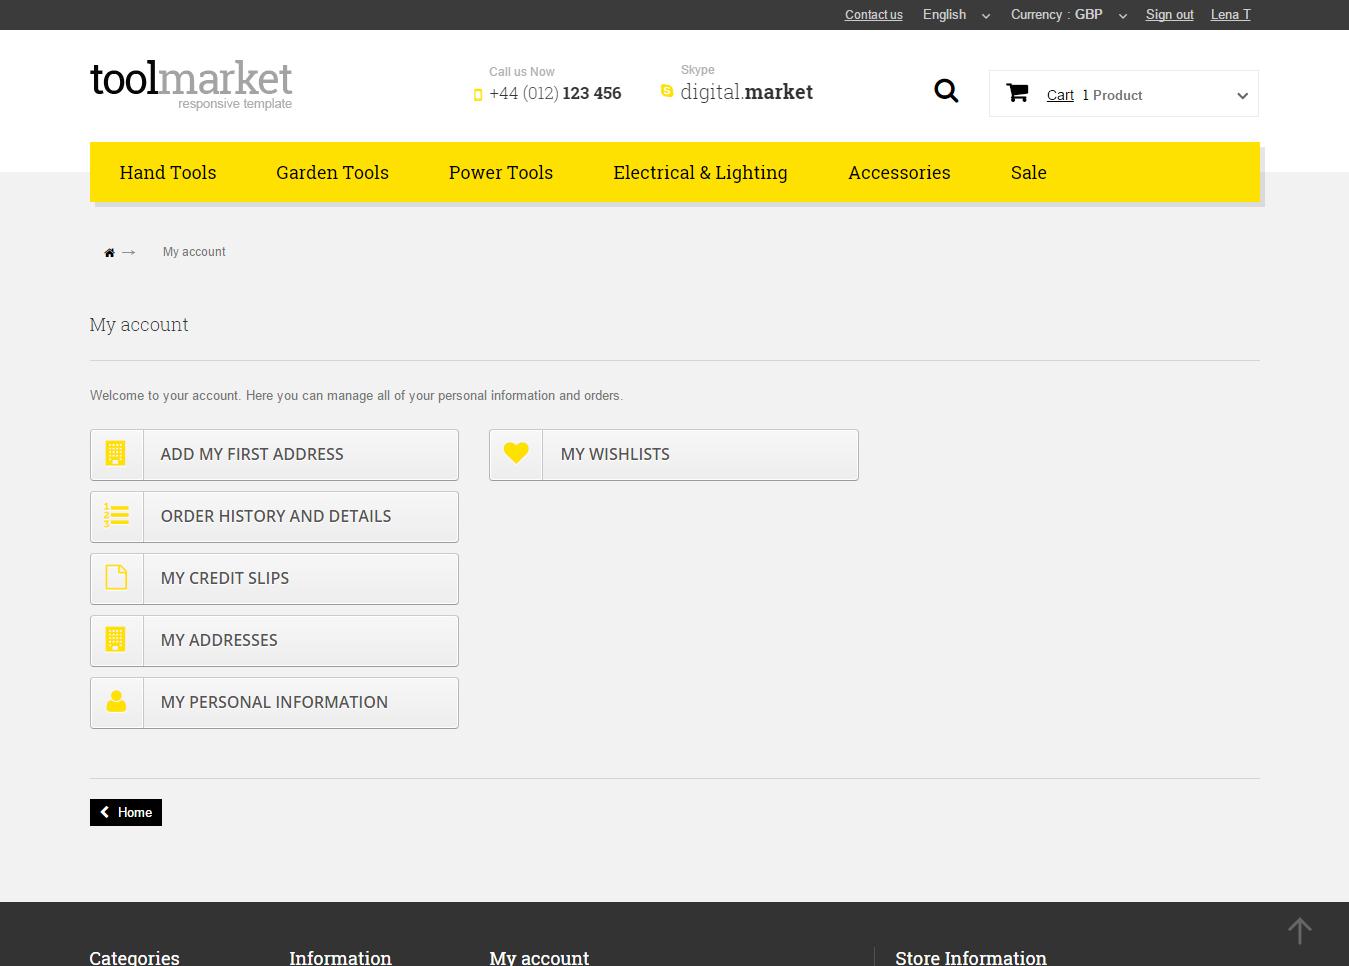 9Tools Market Prestashop 1.6